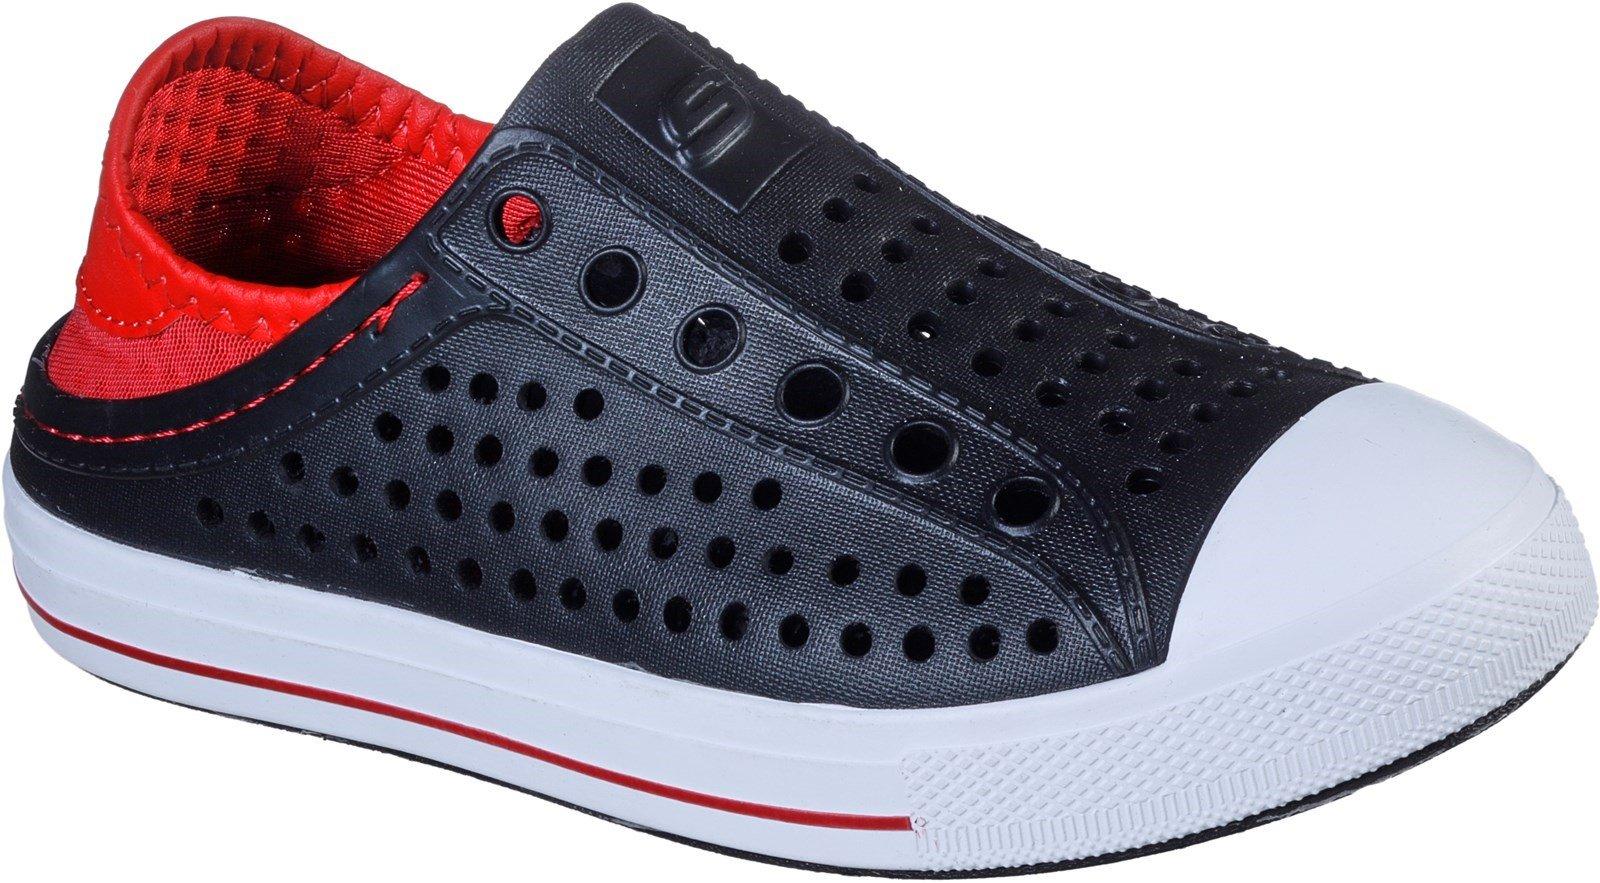 Skechers Unisex Guzman Steps Aqua Surge Slip On Sandal Multicolor 30778 - Black/Red 9.5